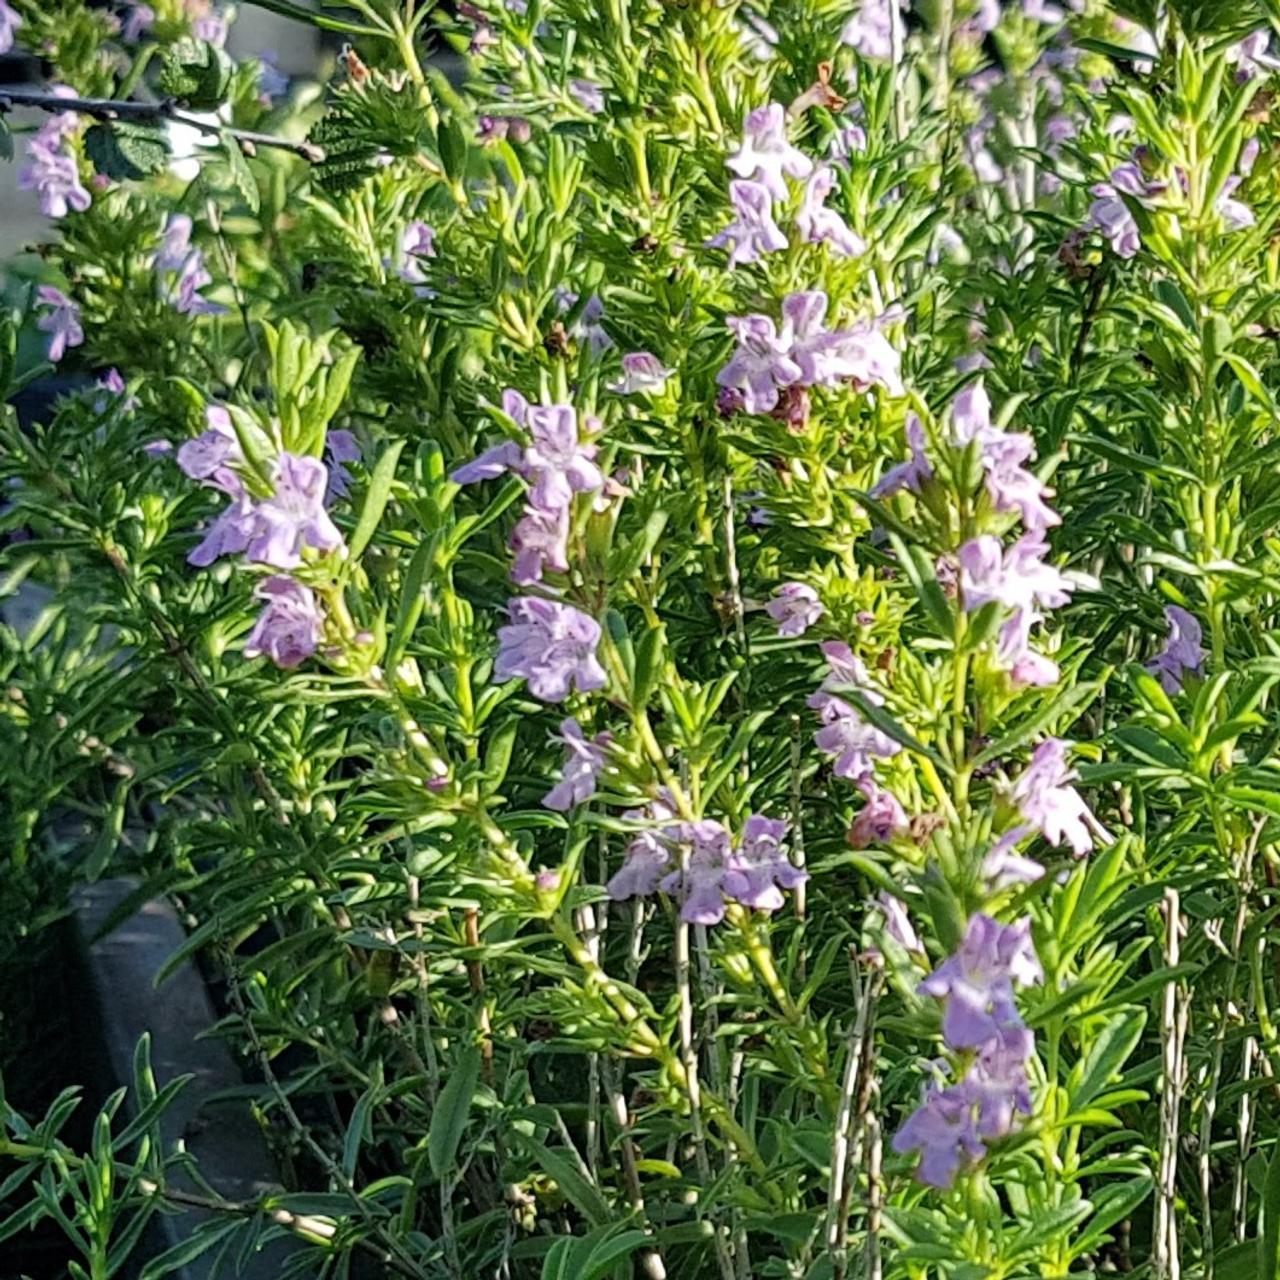 Satureja montana ssp. illyrica plant